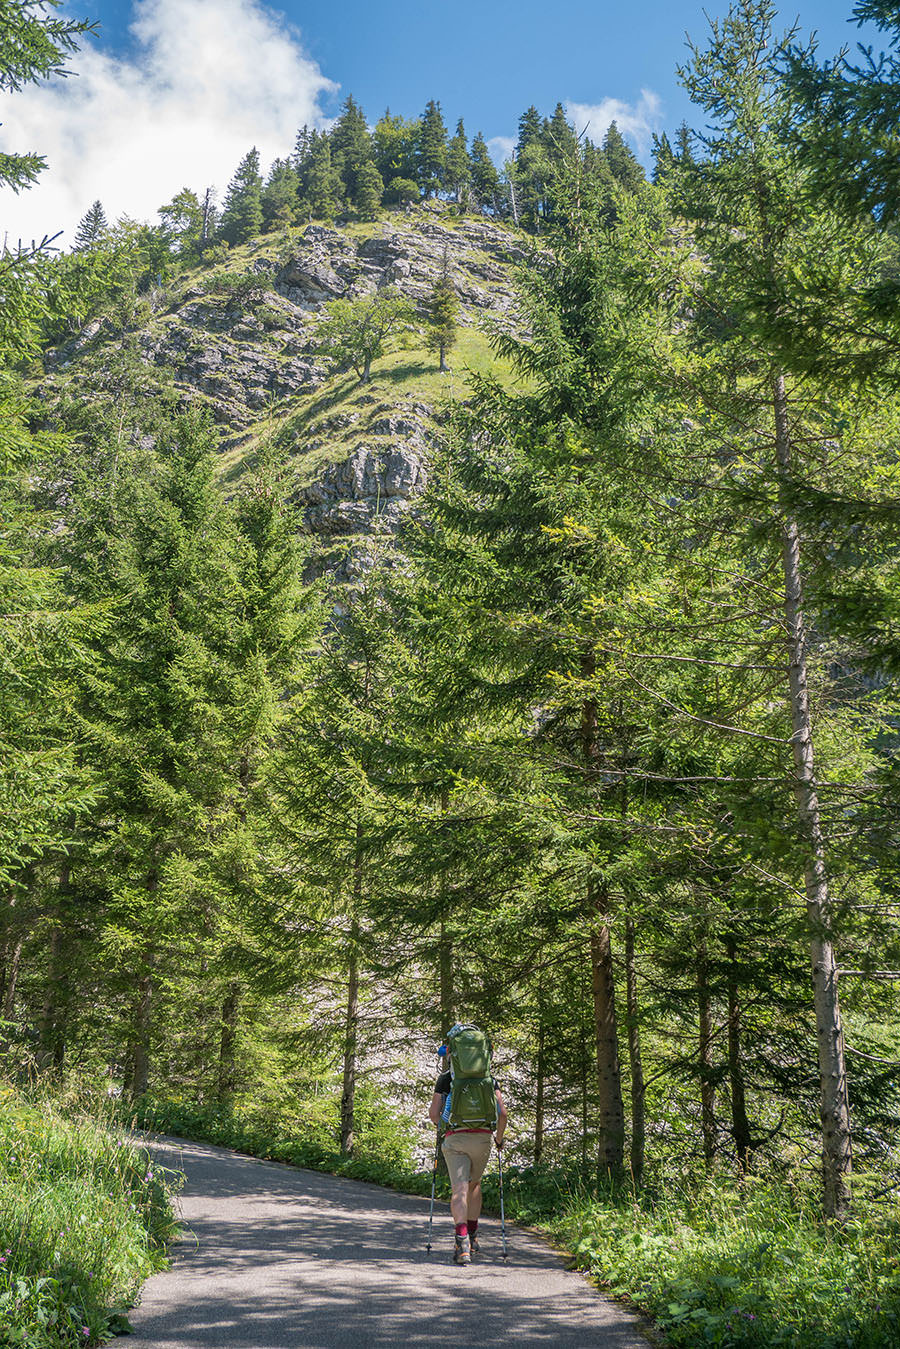 Oberjoch Wandern - Wanderung zum Spieser - Forststrasse